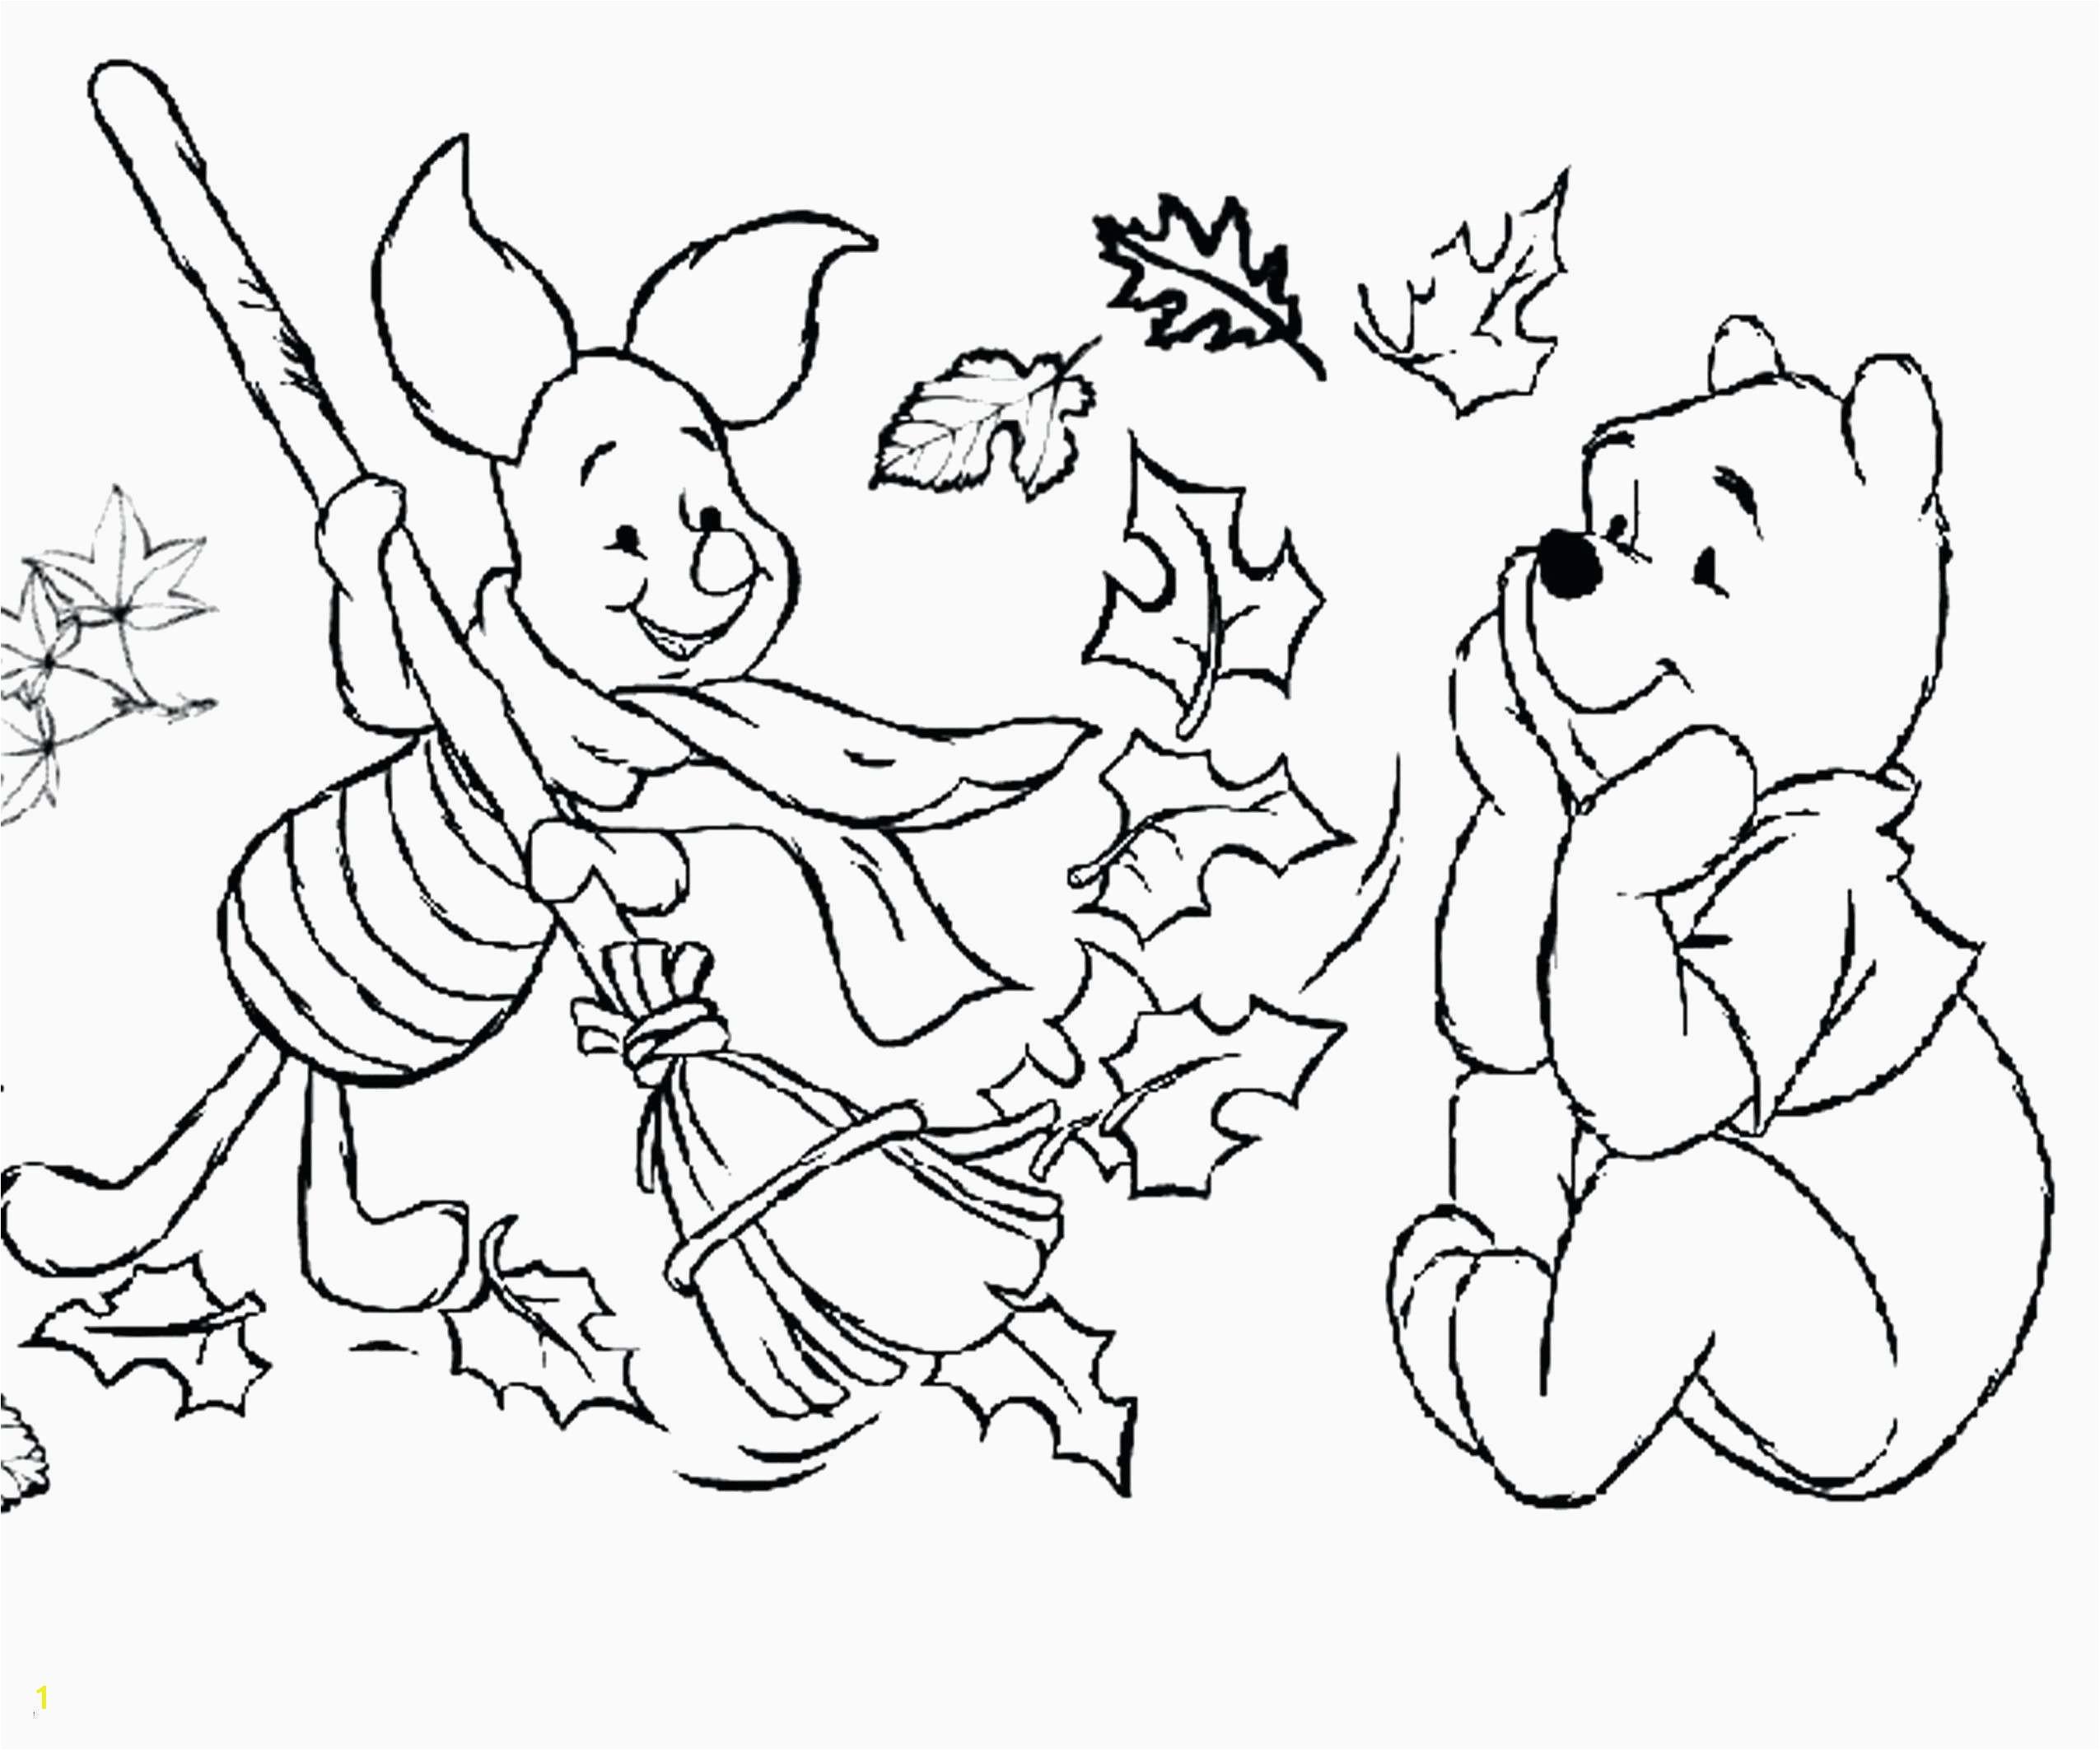 Disney Coloring Pages Princess Free Coloring Sheets Disney Princess Coloring Pages for Kids Free Coloring Sheets